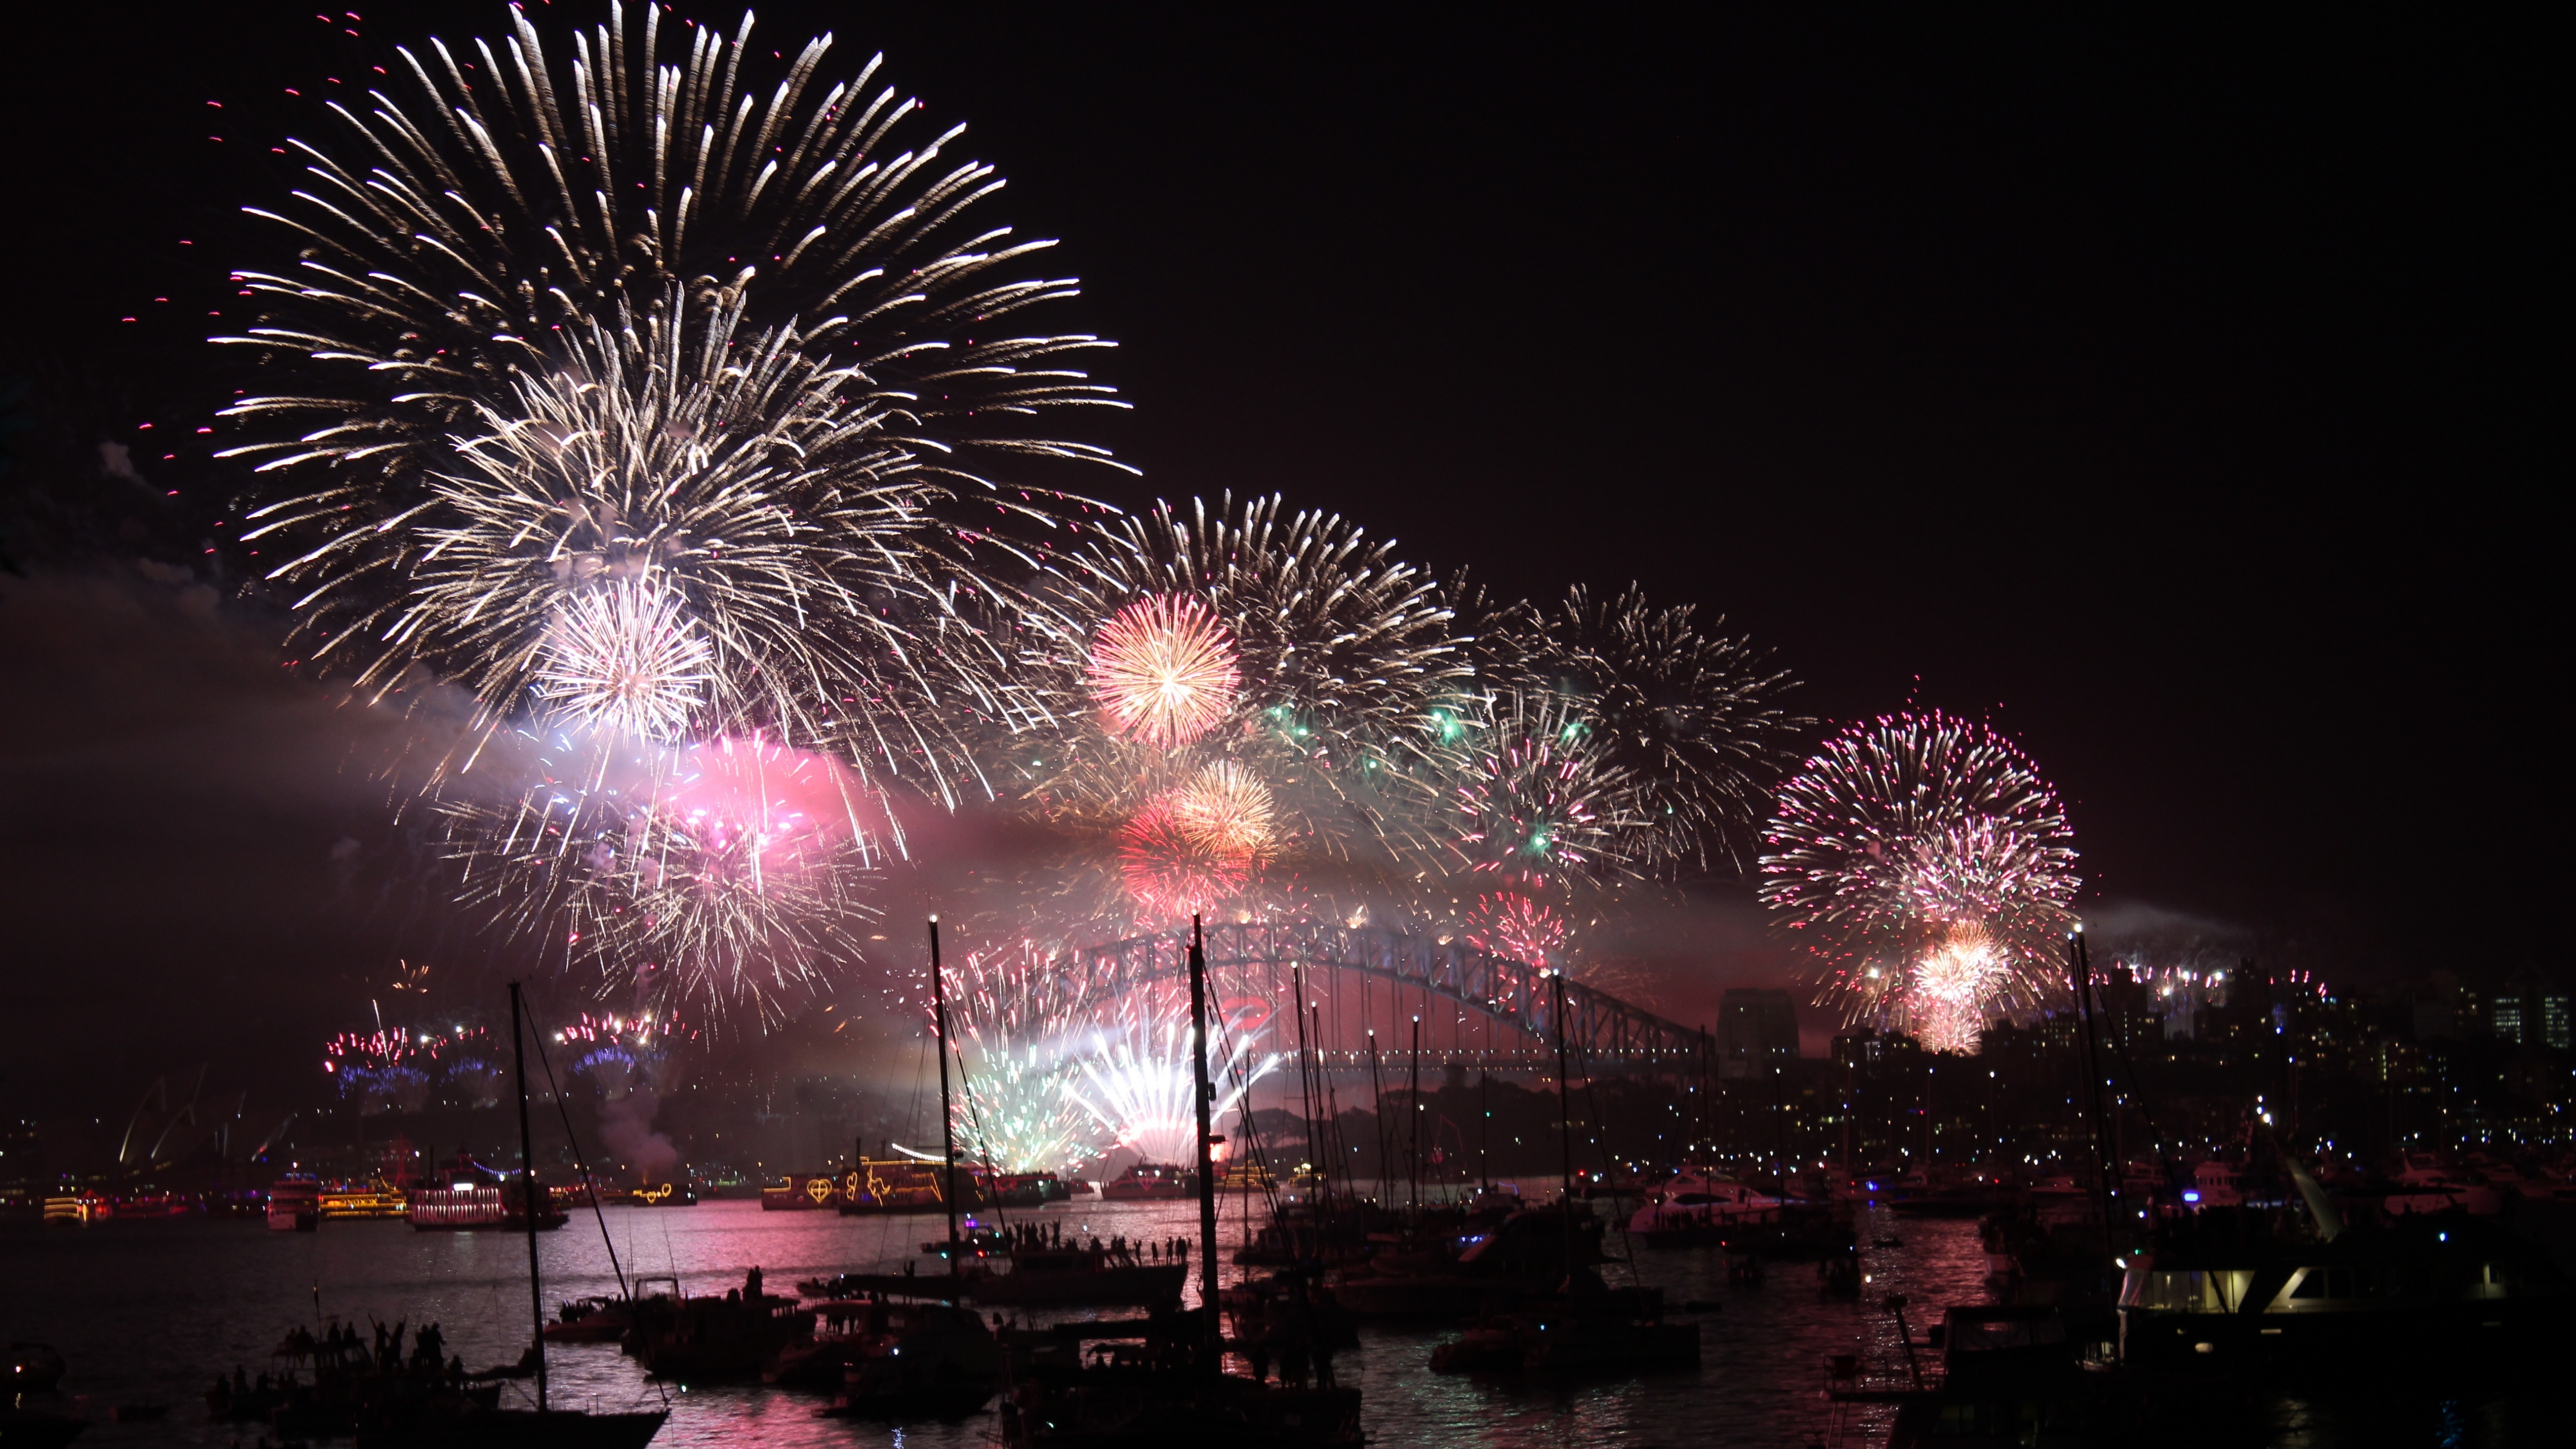 Fireworks in Sydney, Australia wallpaper